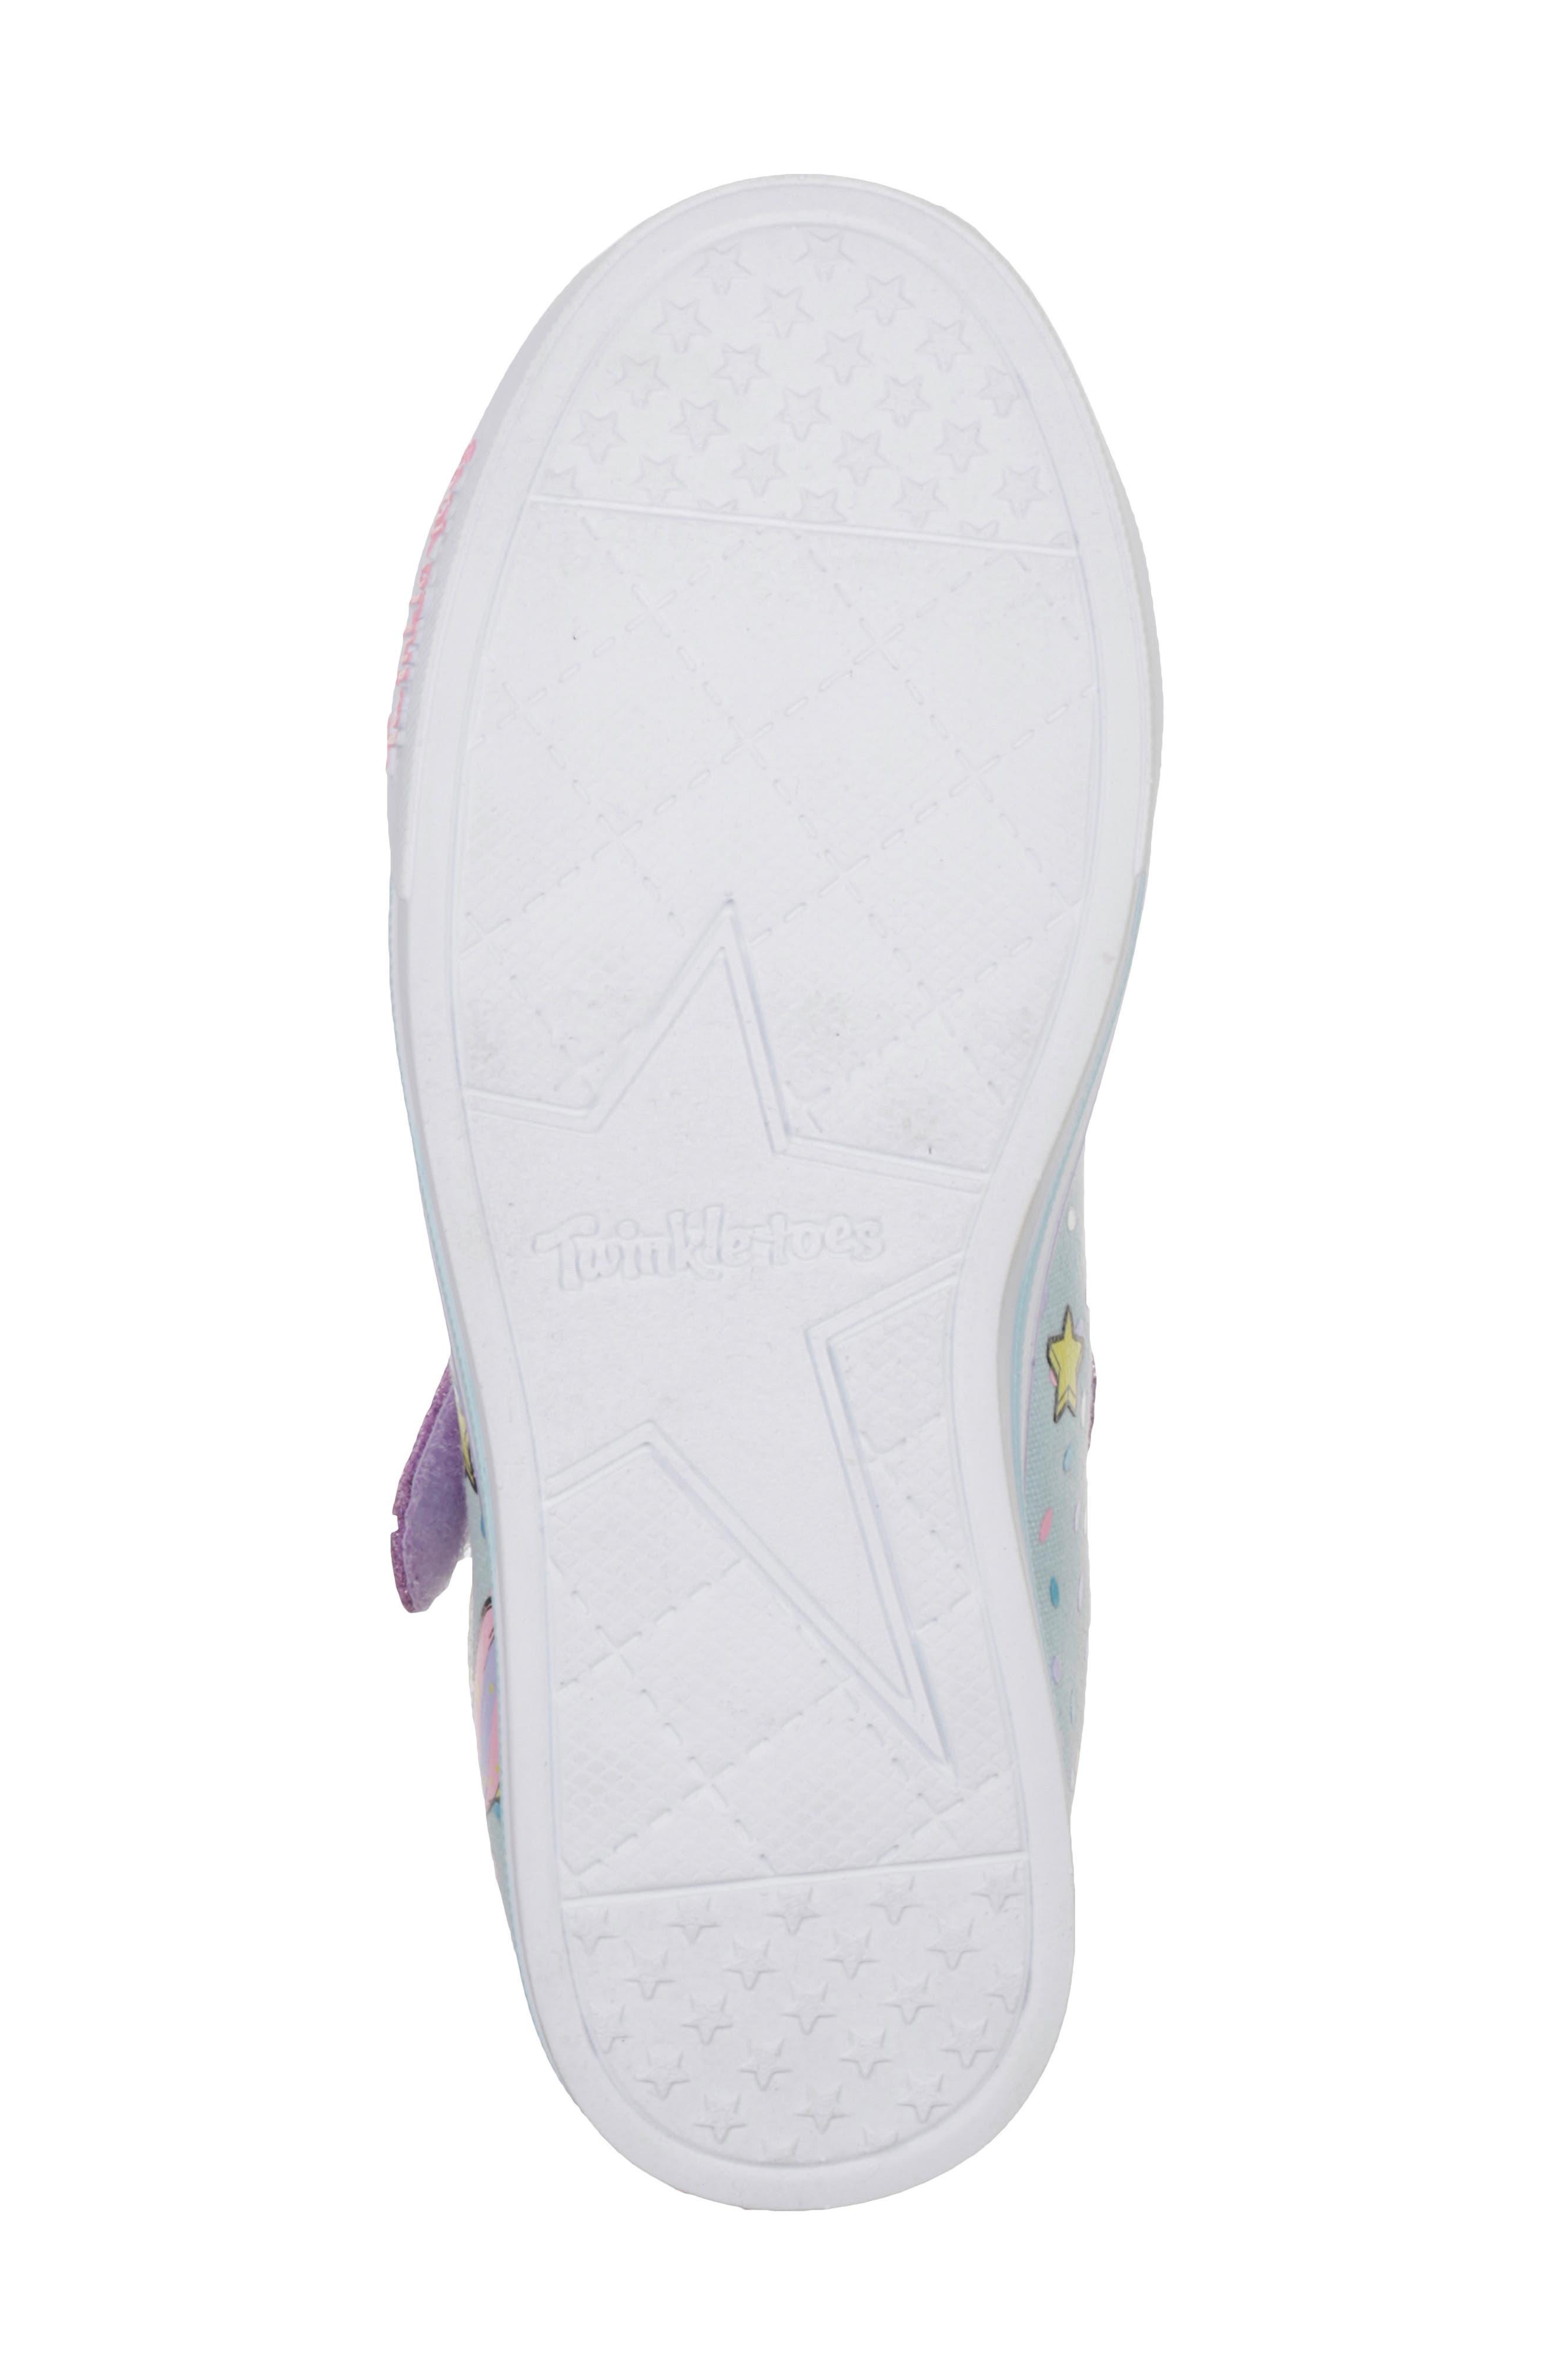 Twinkle Toes Unicorn Light-Up Sneaker,                         Main,                         color, LIGHT BLUE/ MULTI